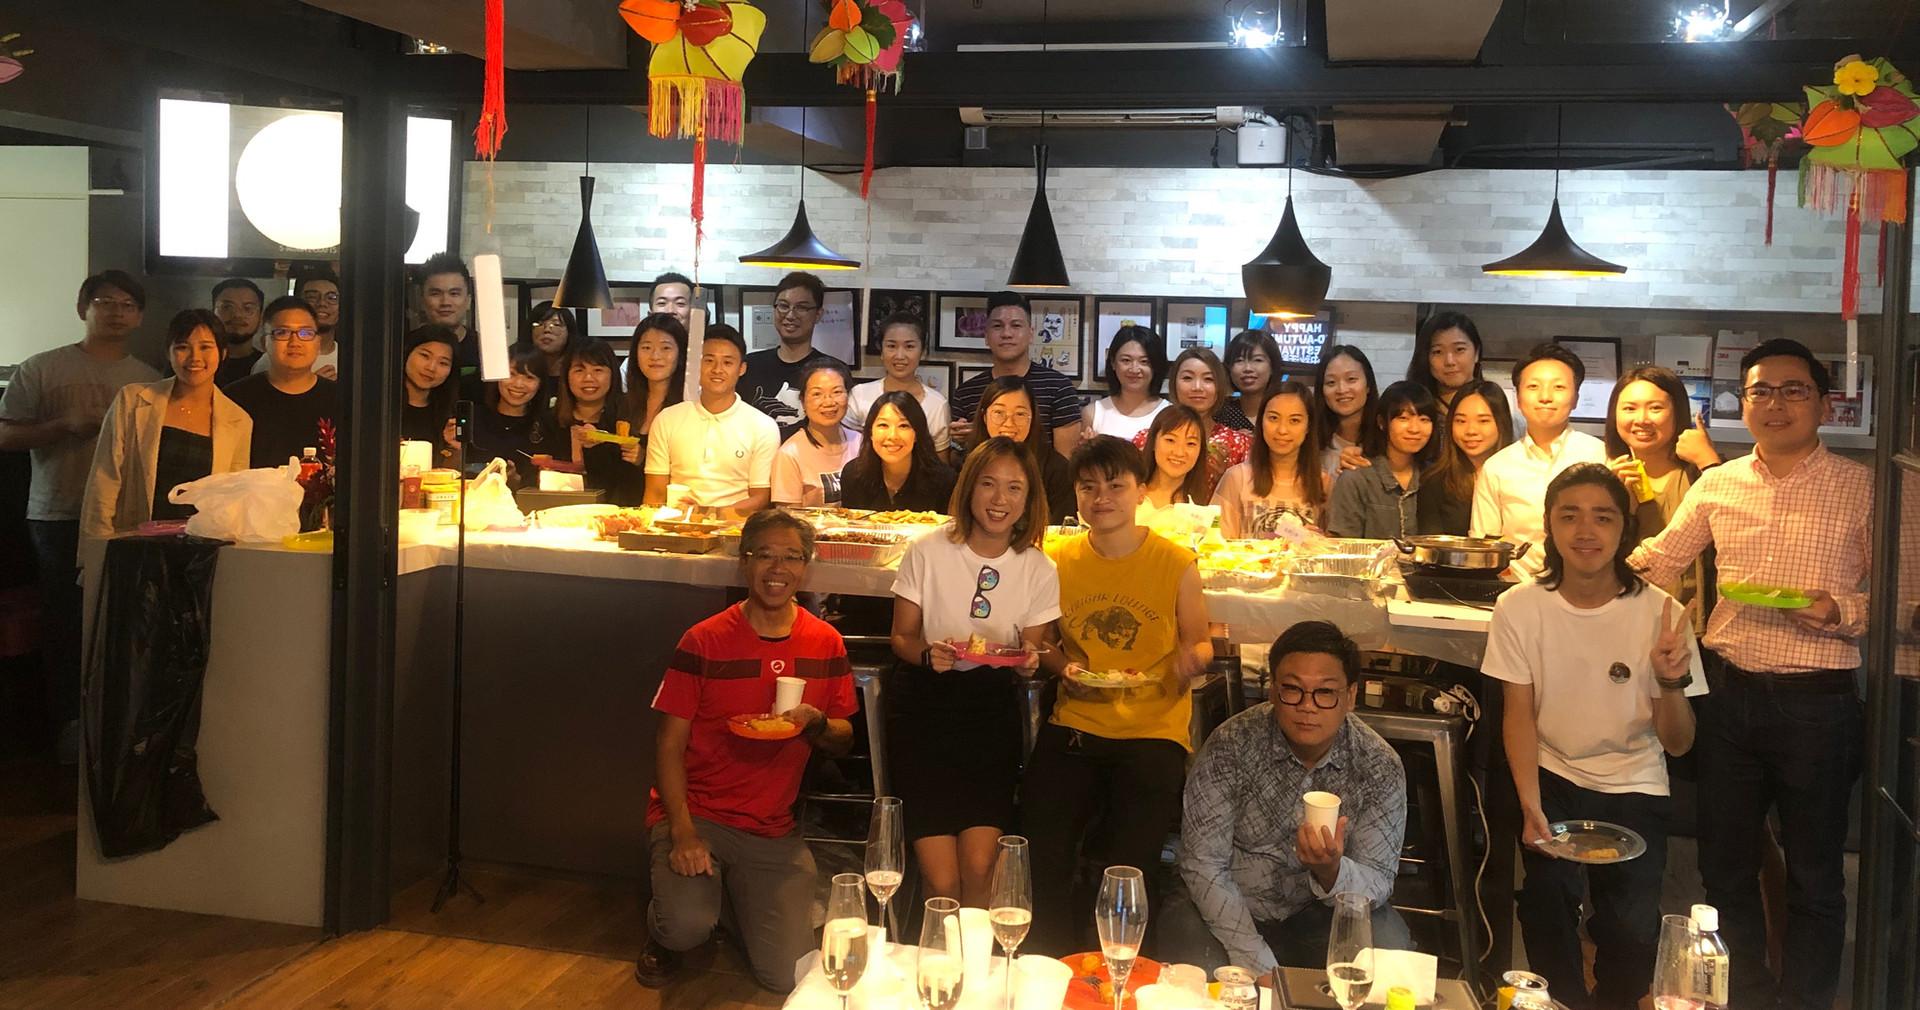 Eventist Mid-Autmn Festival Party 中秋节派对2019